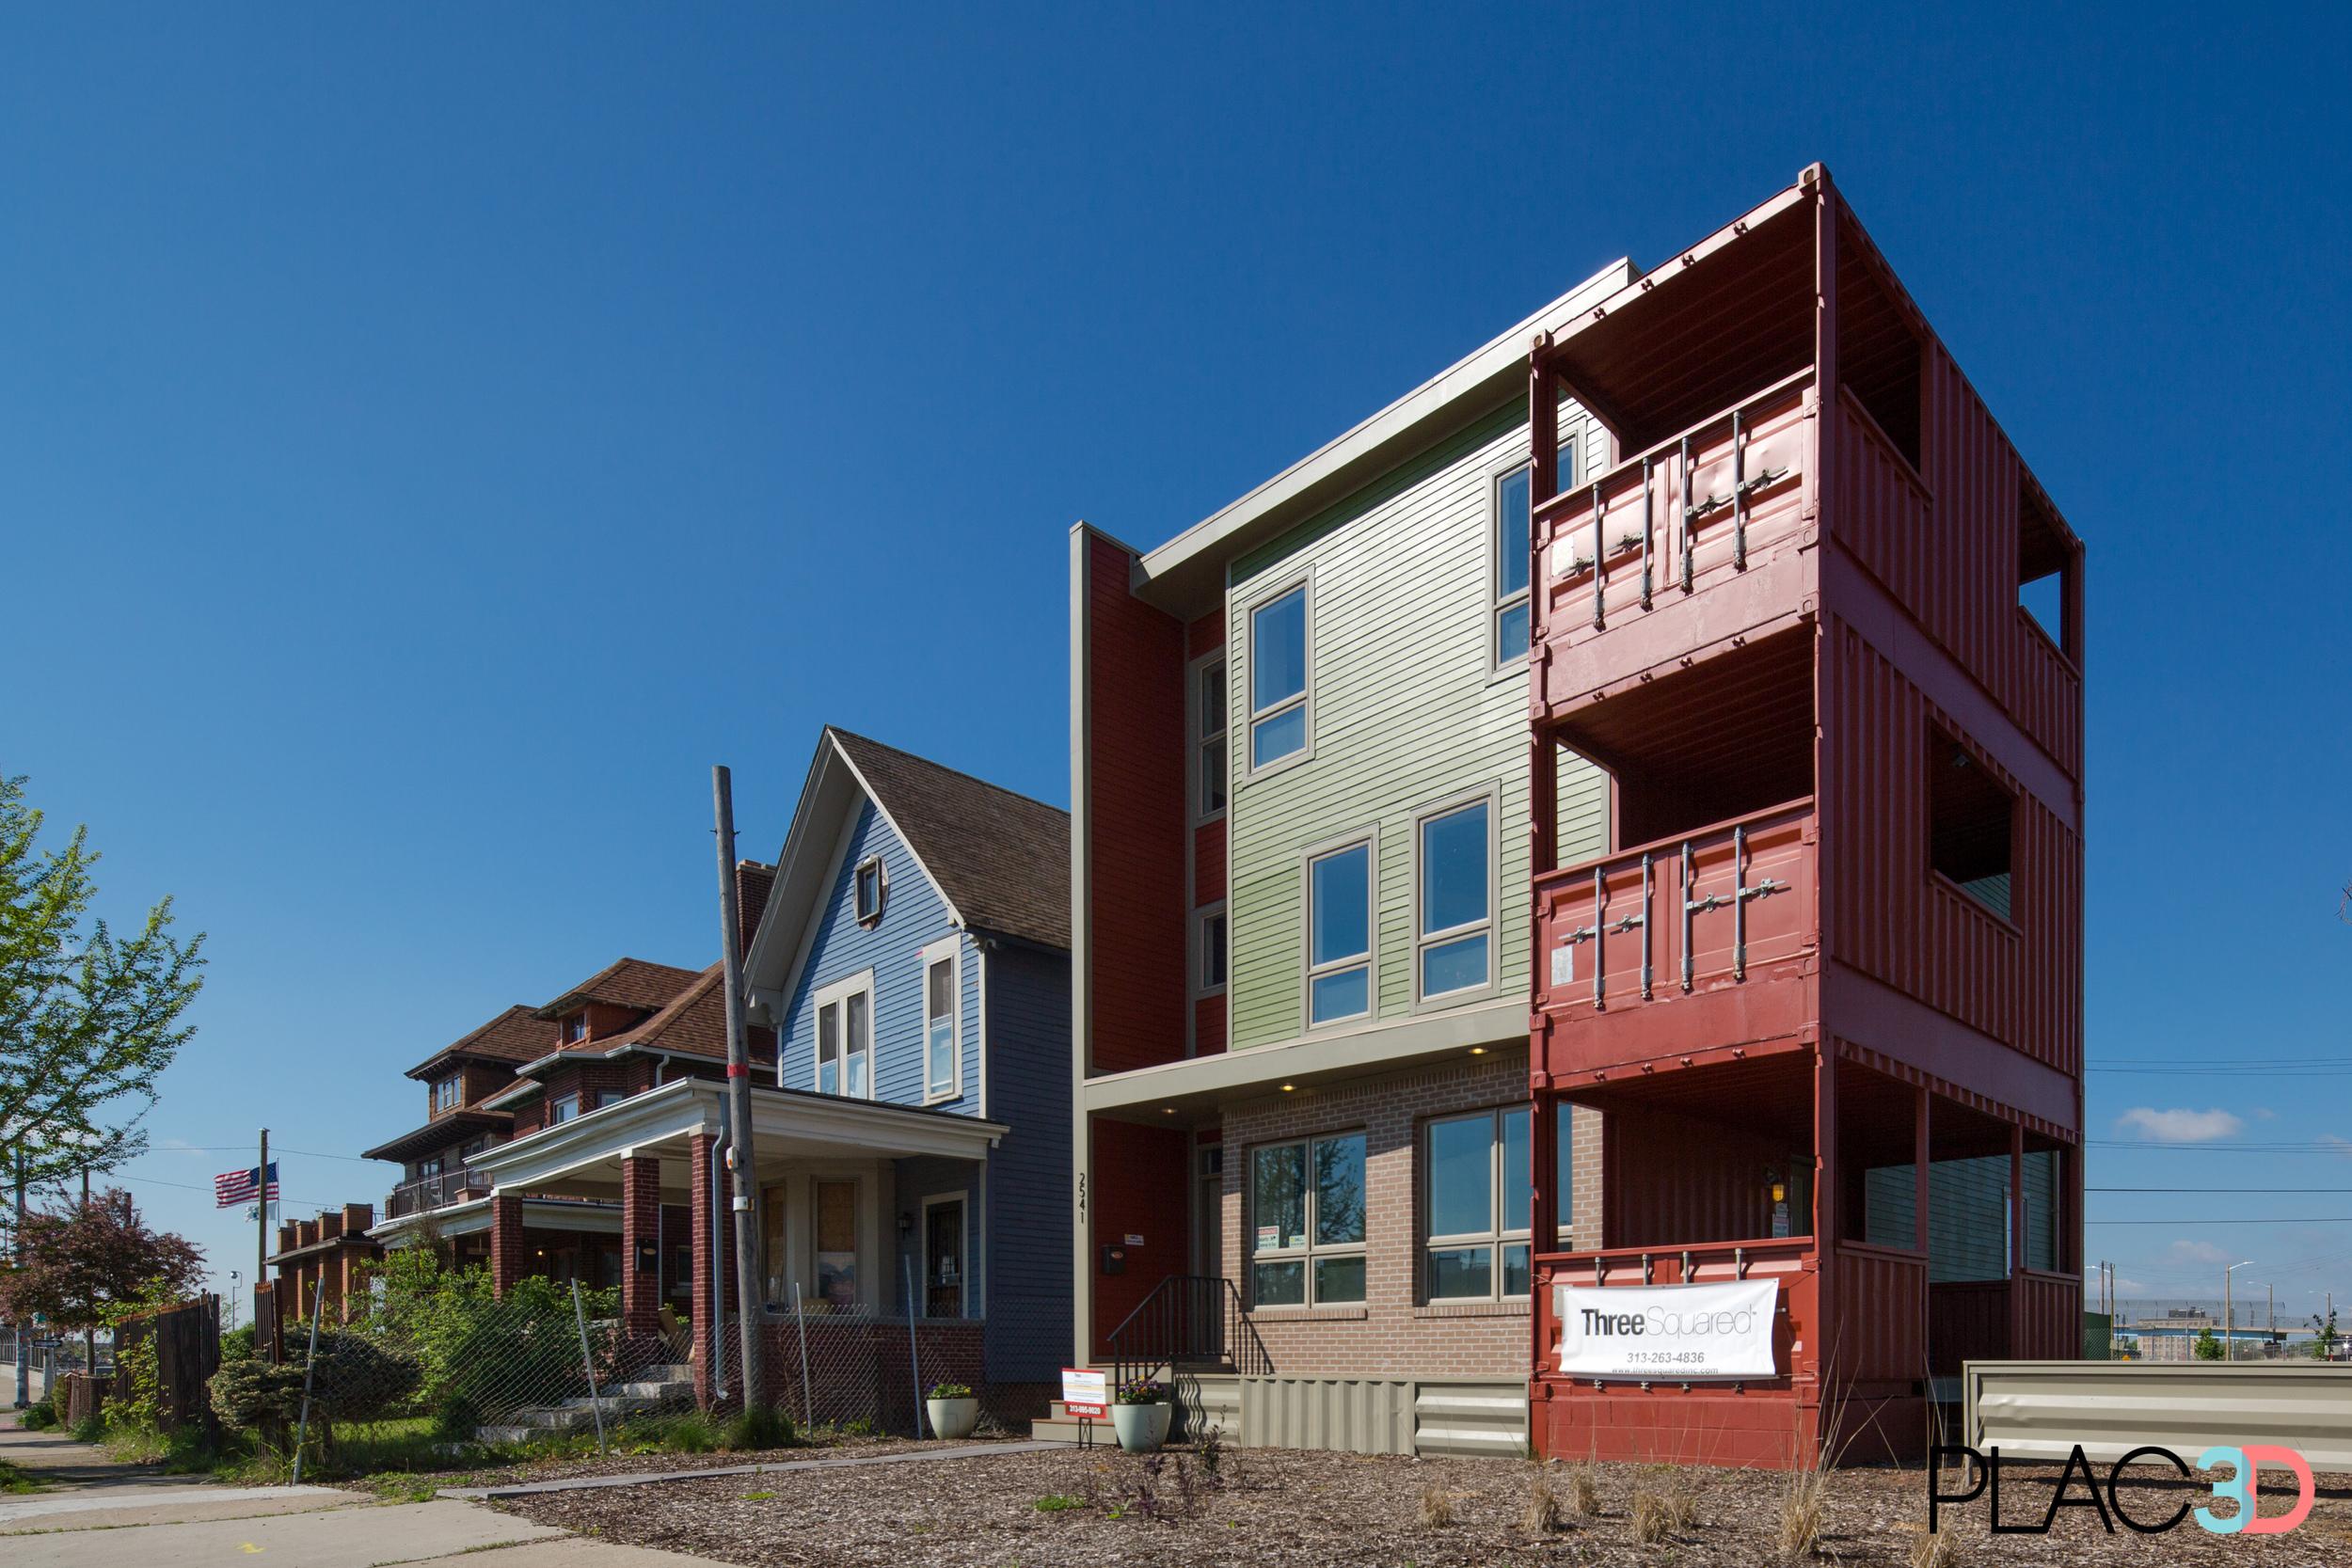 Three Squared Model Center on Trumbull in Detroit's Corktown neighborhood